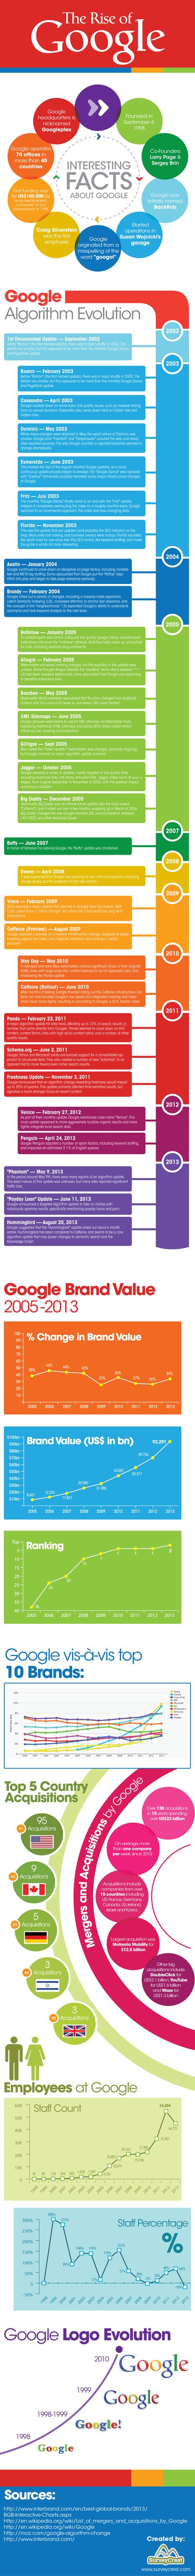 Infografy : Google Algorithm History | Web Marketing Random | Scoop.it